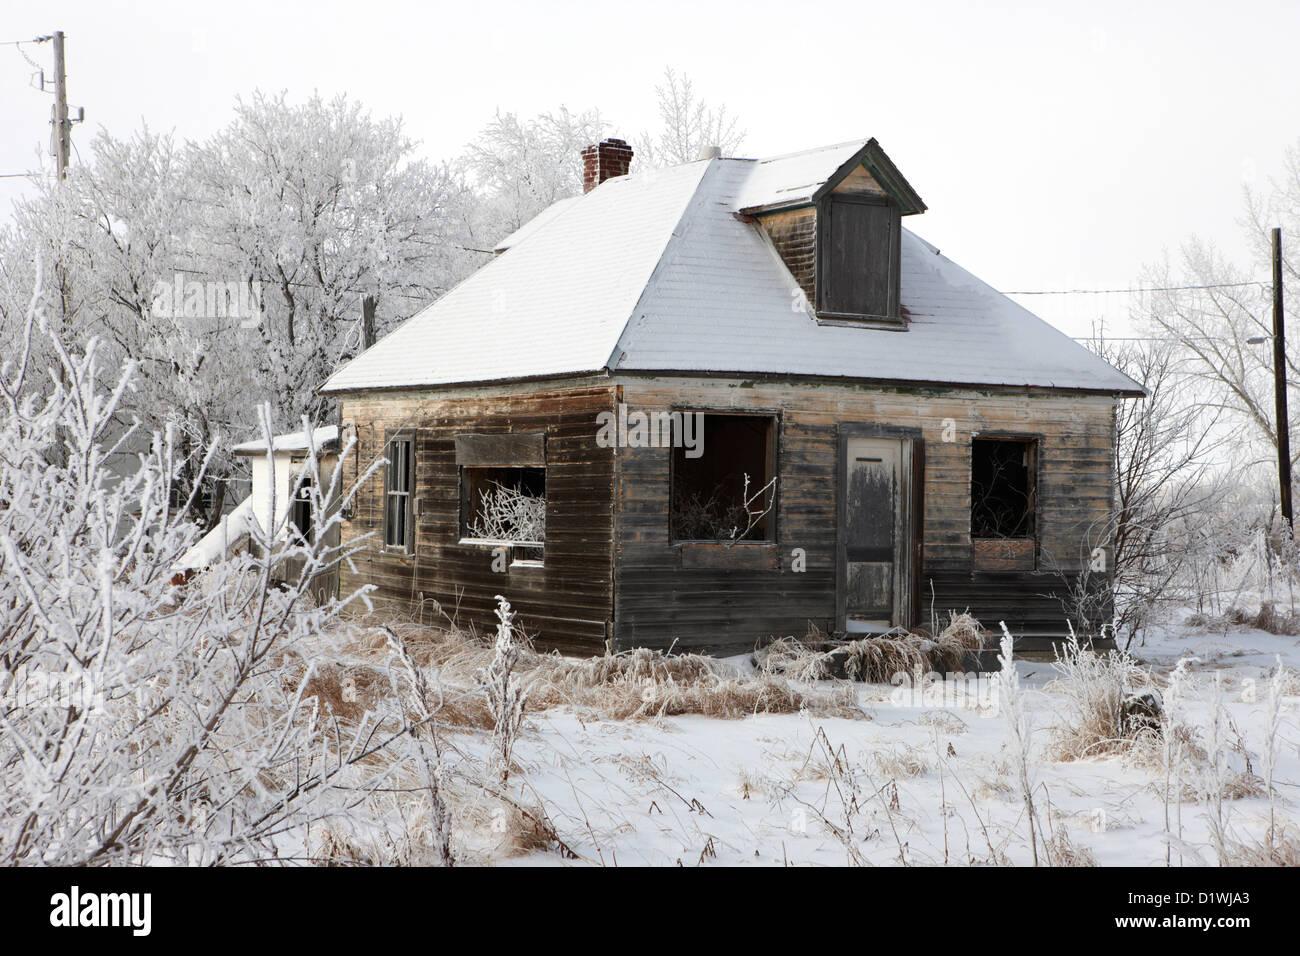 derelict empty wooden traditional house in rural village Forget Saskatchewan Canada - Stock Image